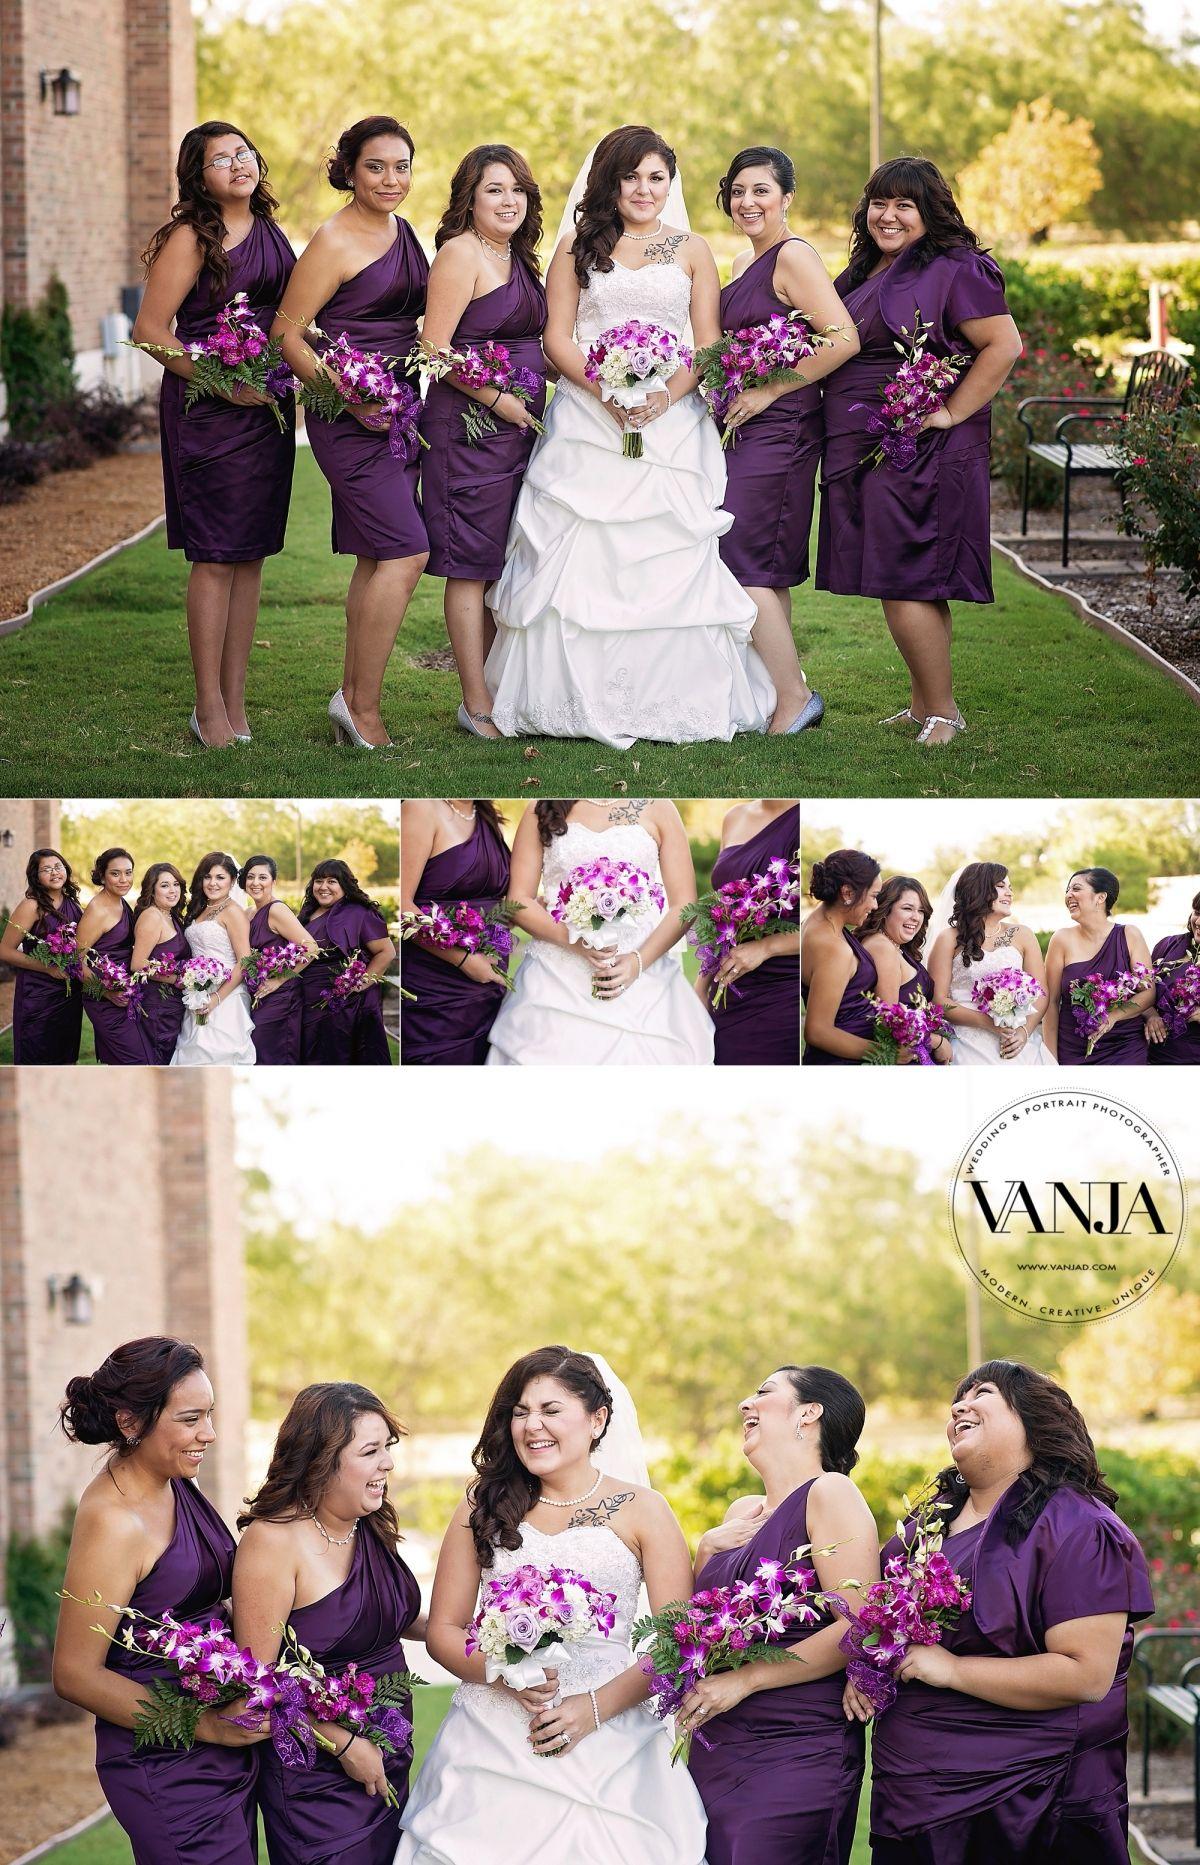 DALLAS WEDDING PHOTOGRAPHER | Dallas wedding photographers ...